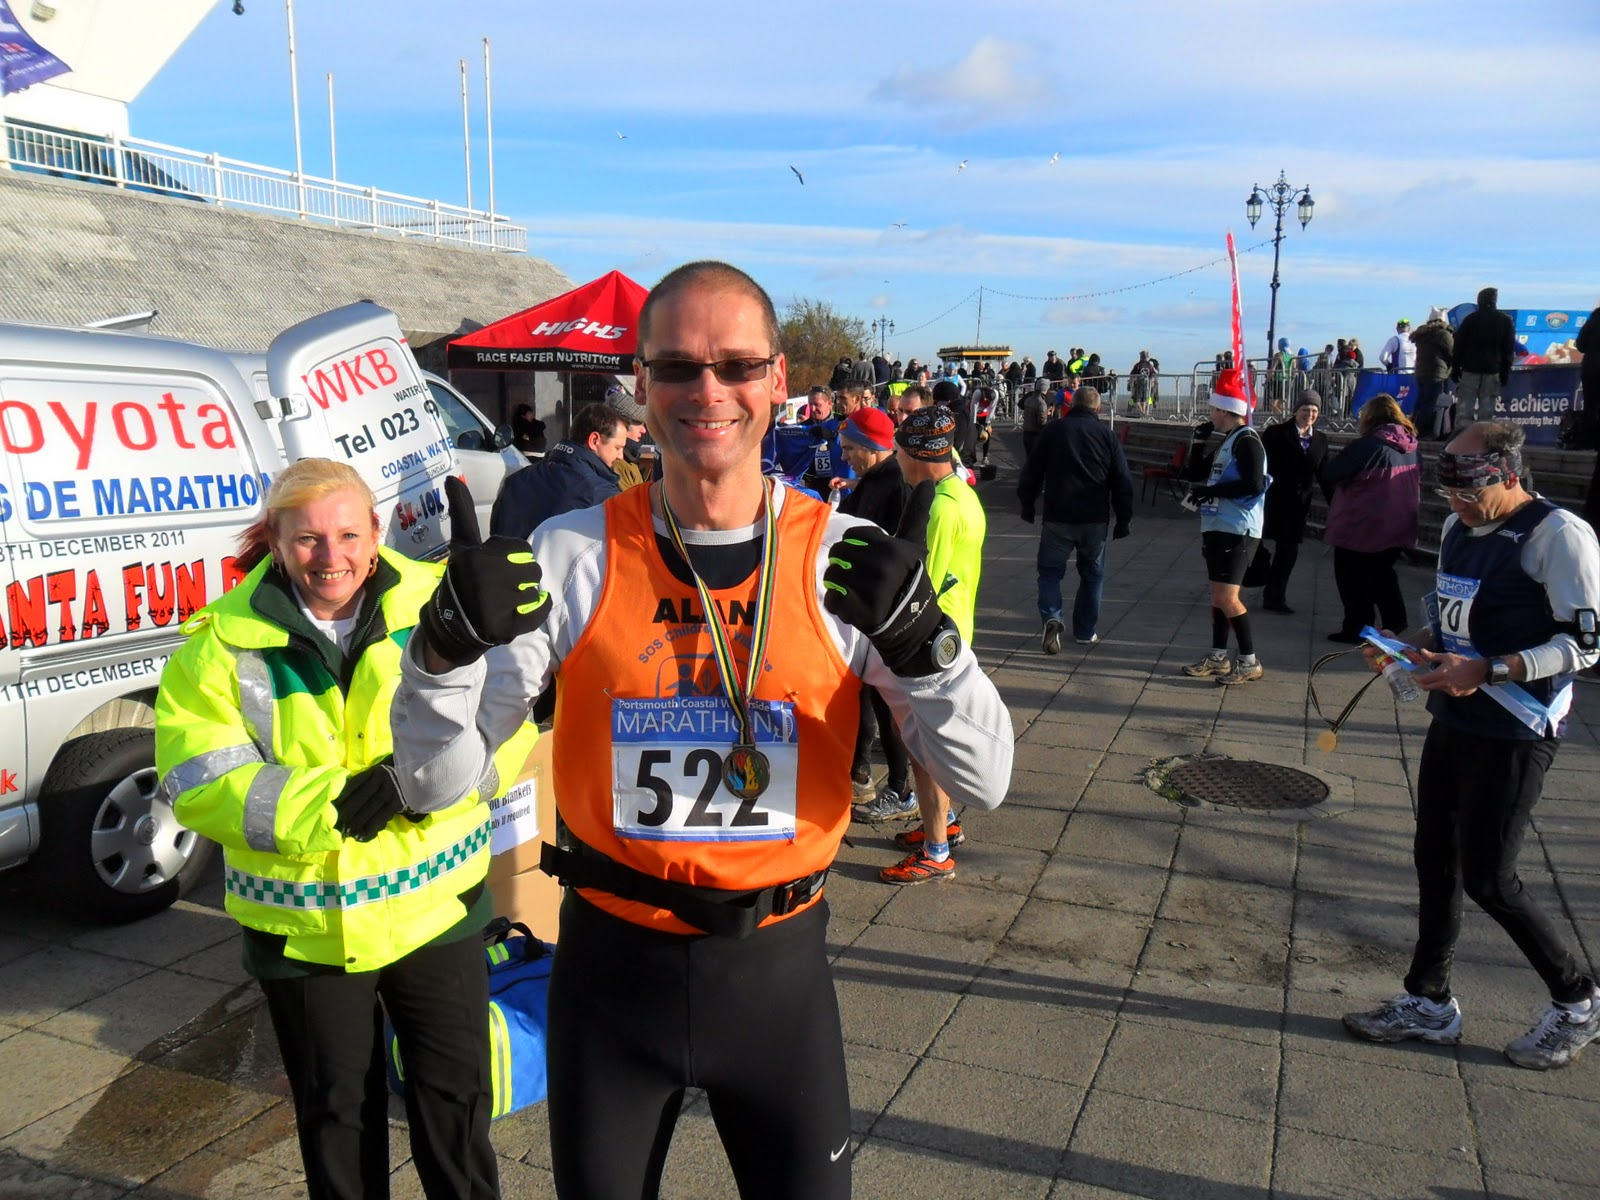 Portsmouth marathon photos 2011